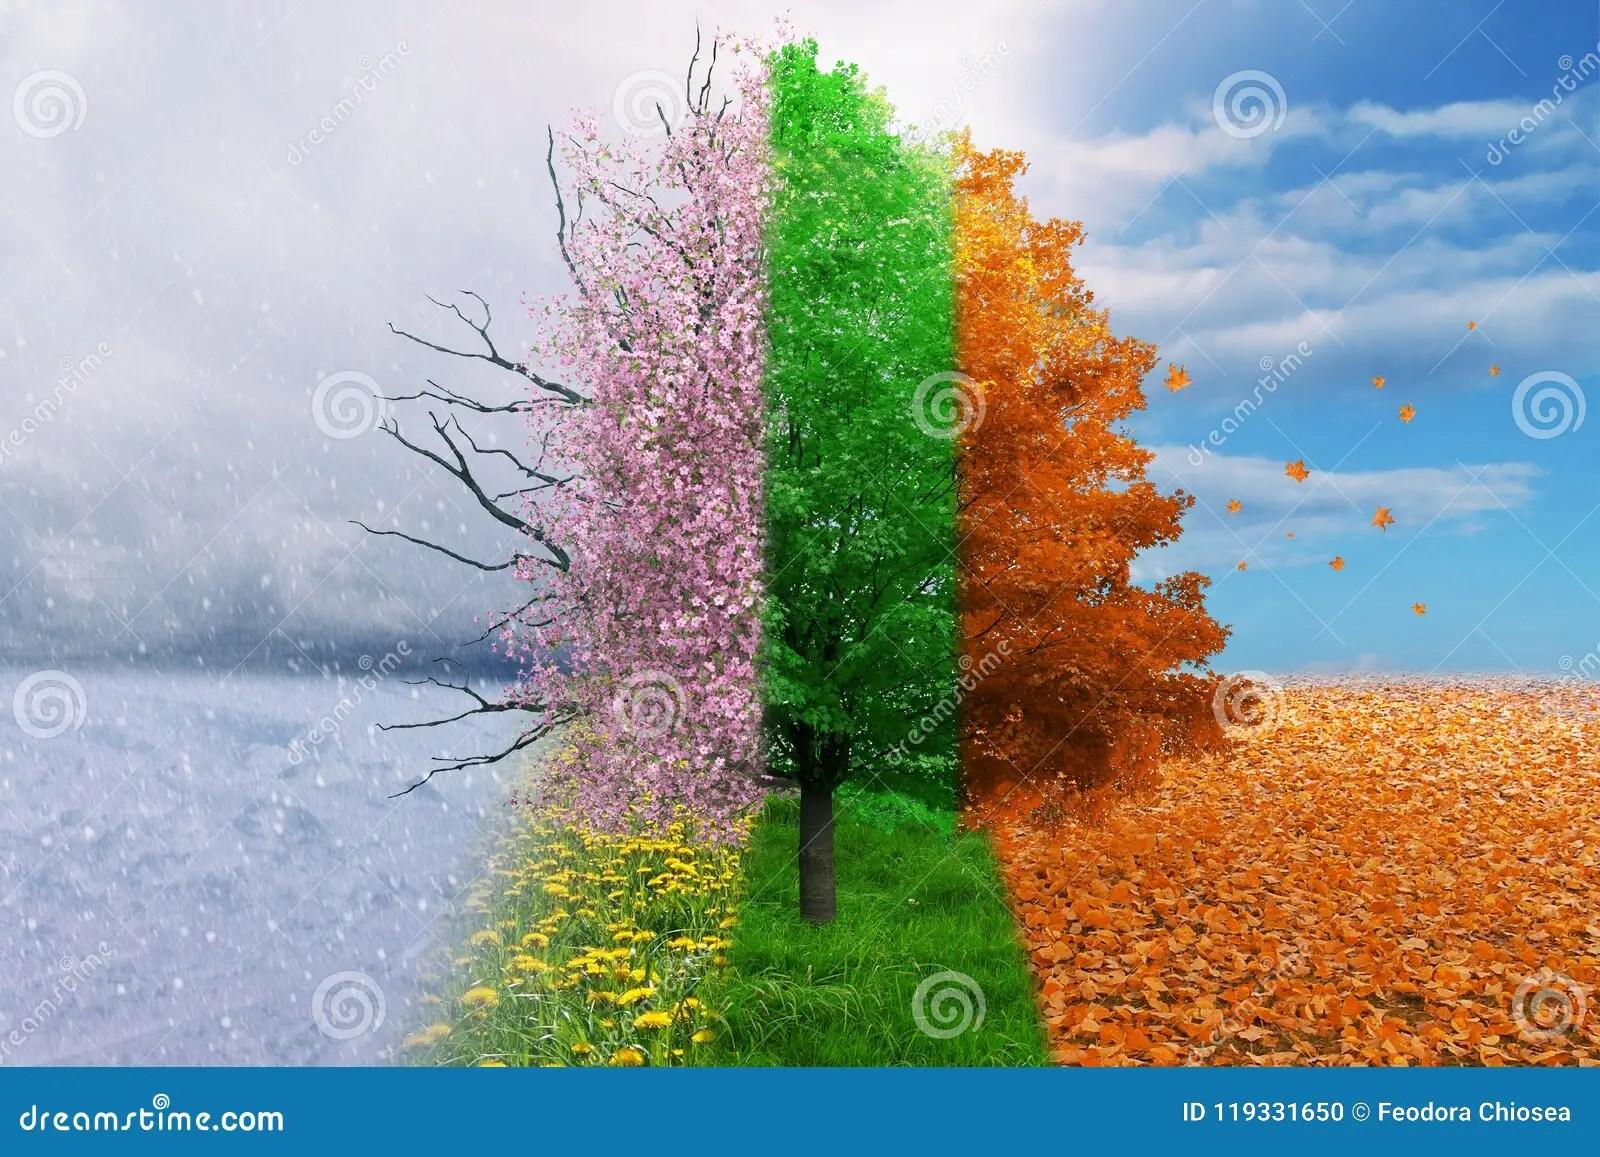 Four Season Change Concept Tree Stock Photo